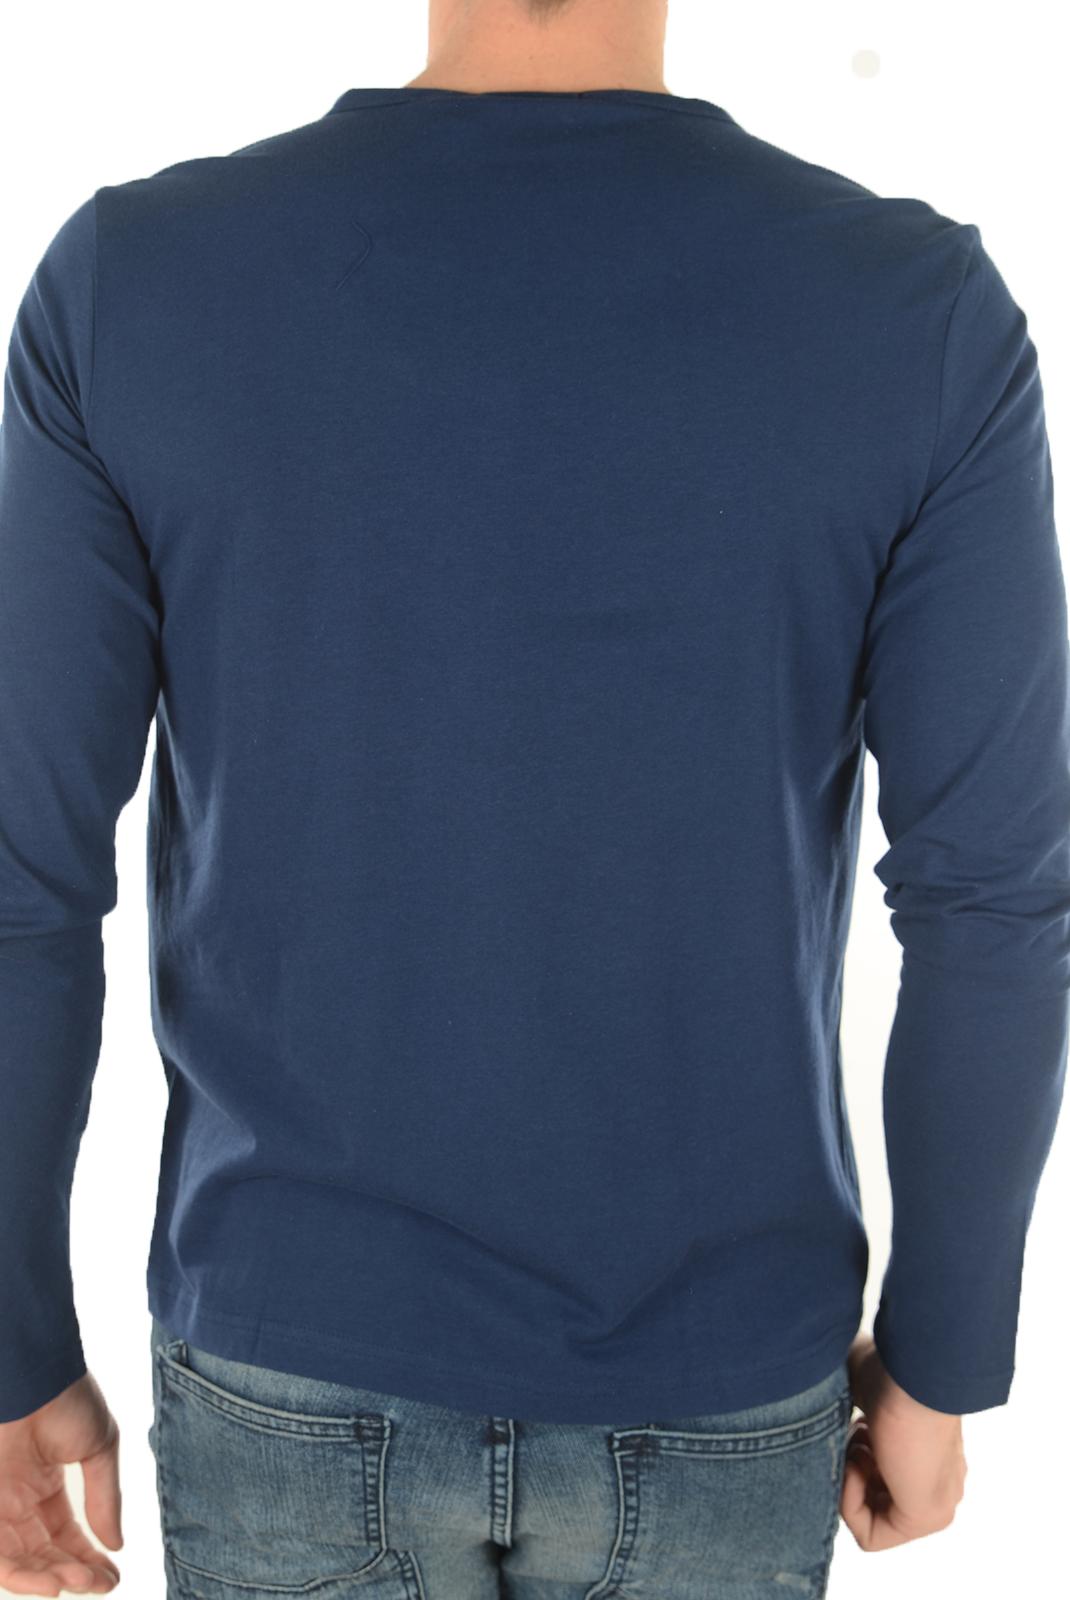 Tee-shirts  Redskins CLOUD WARNER NAVY BLUE